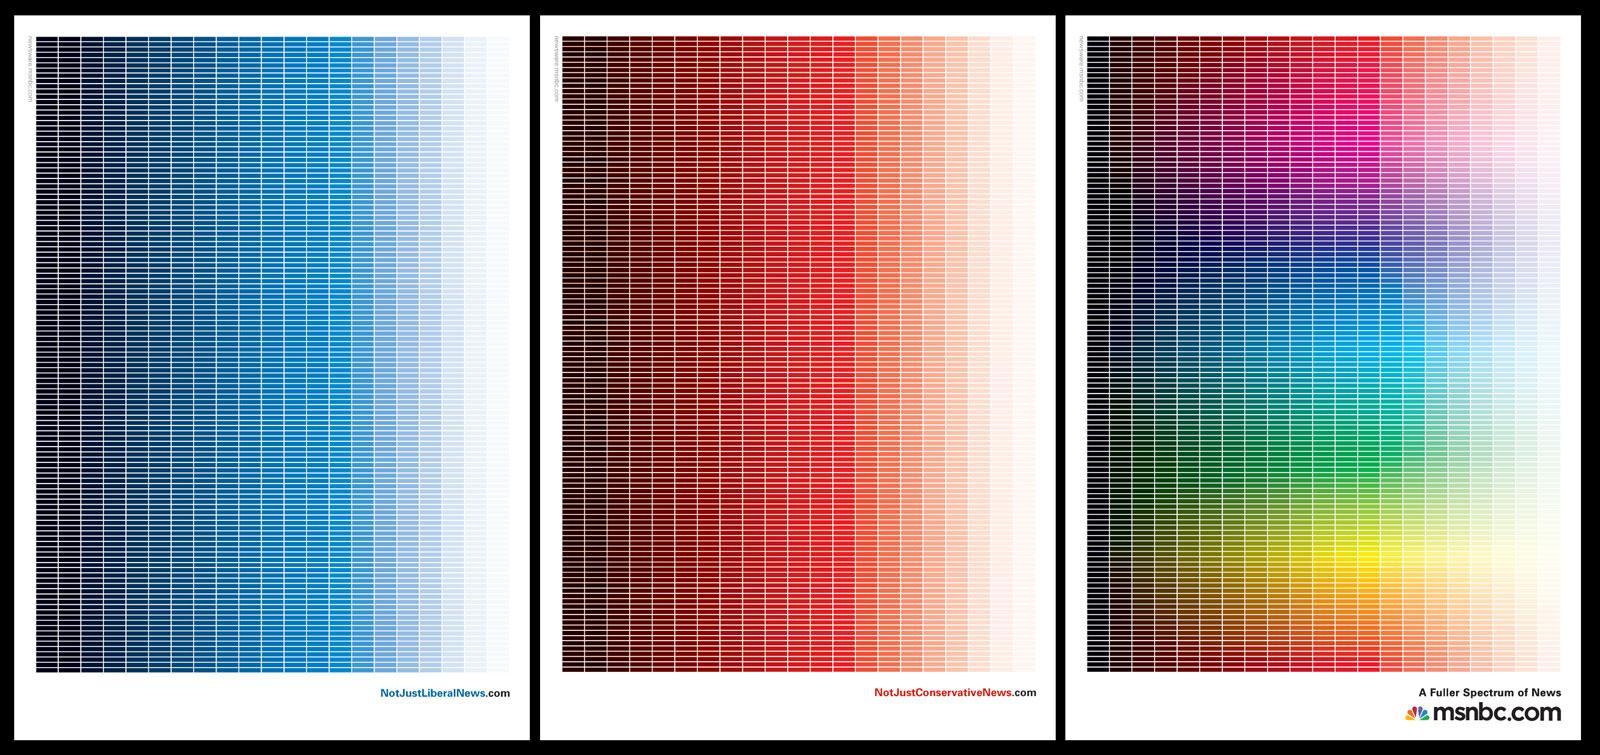 msnbc Print Ad -  A fuller spectrum of news